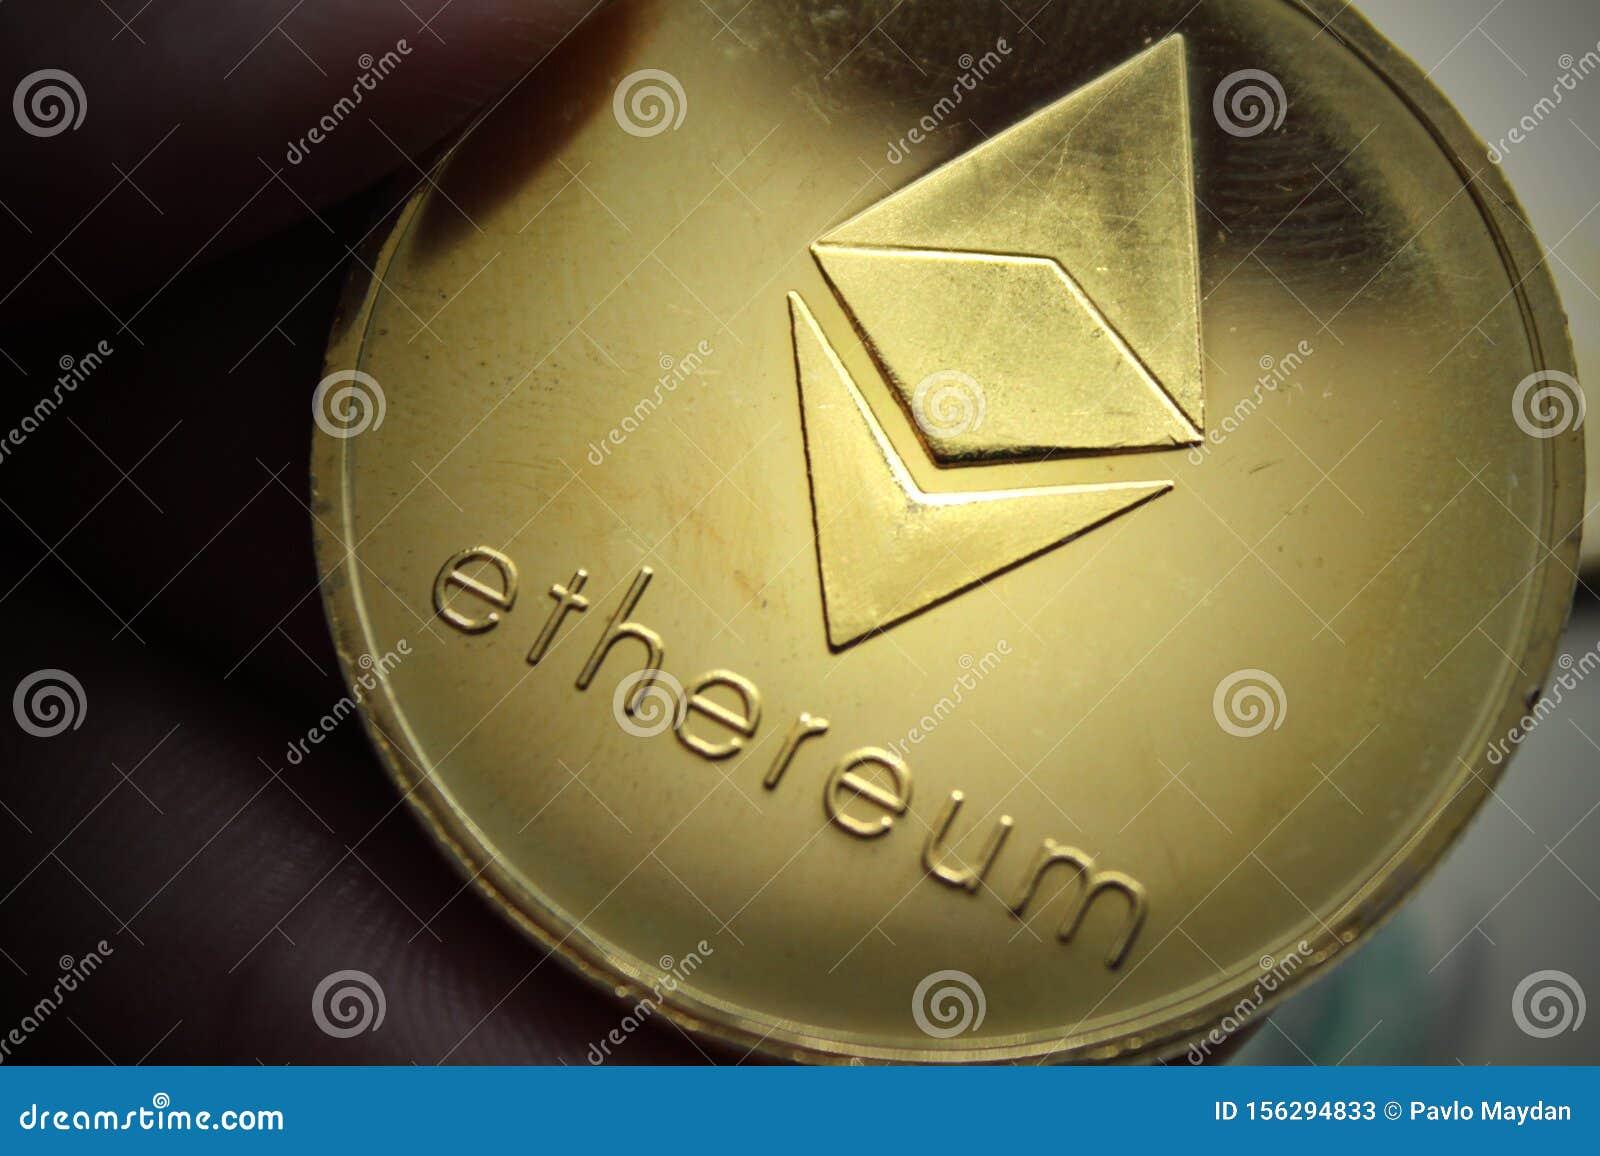 eter bitcoin